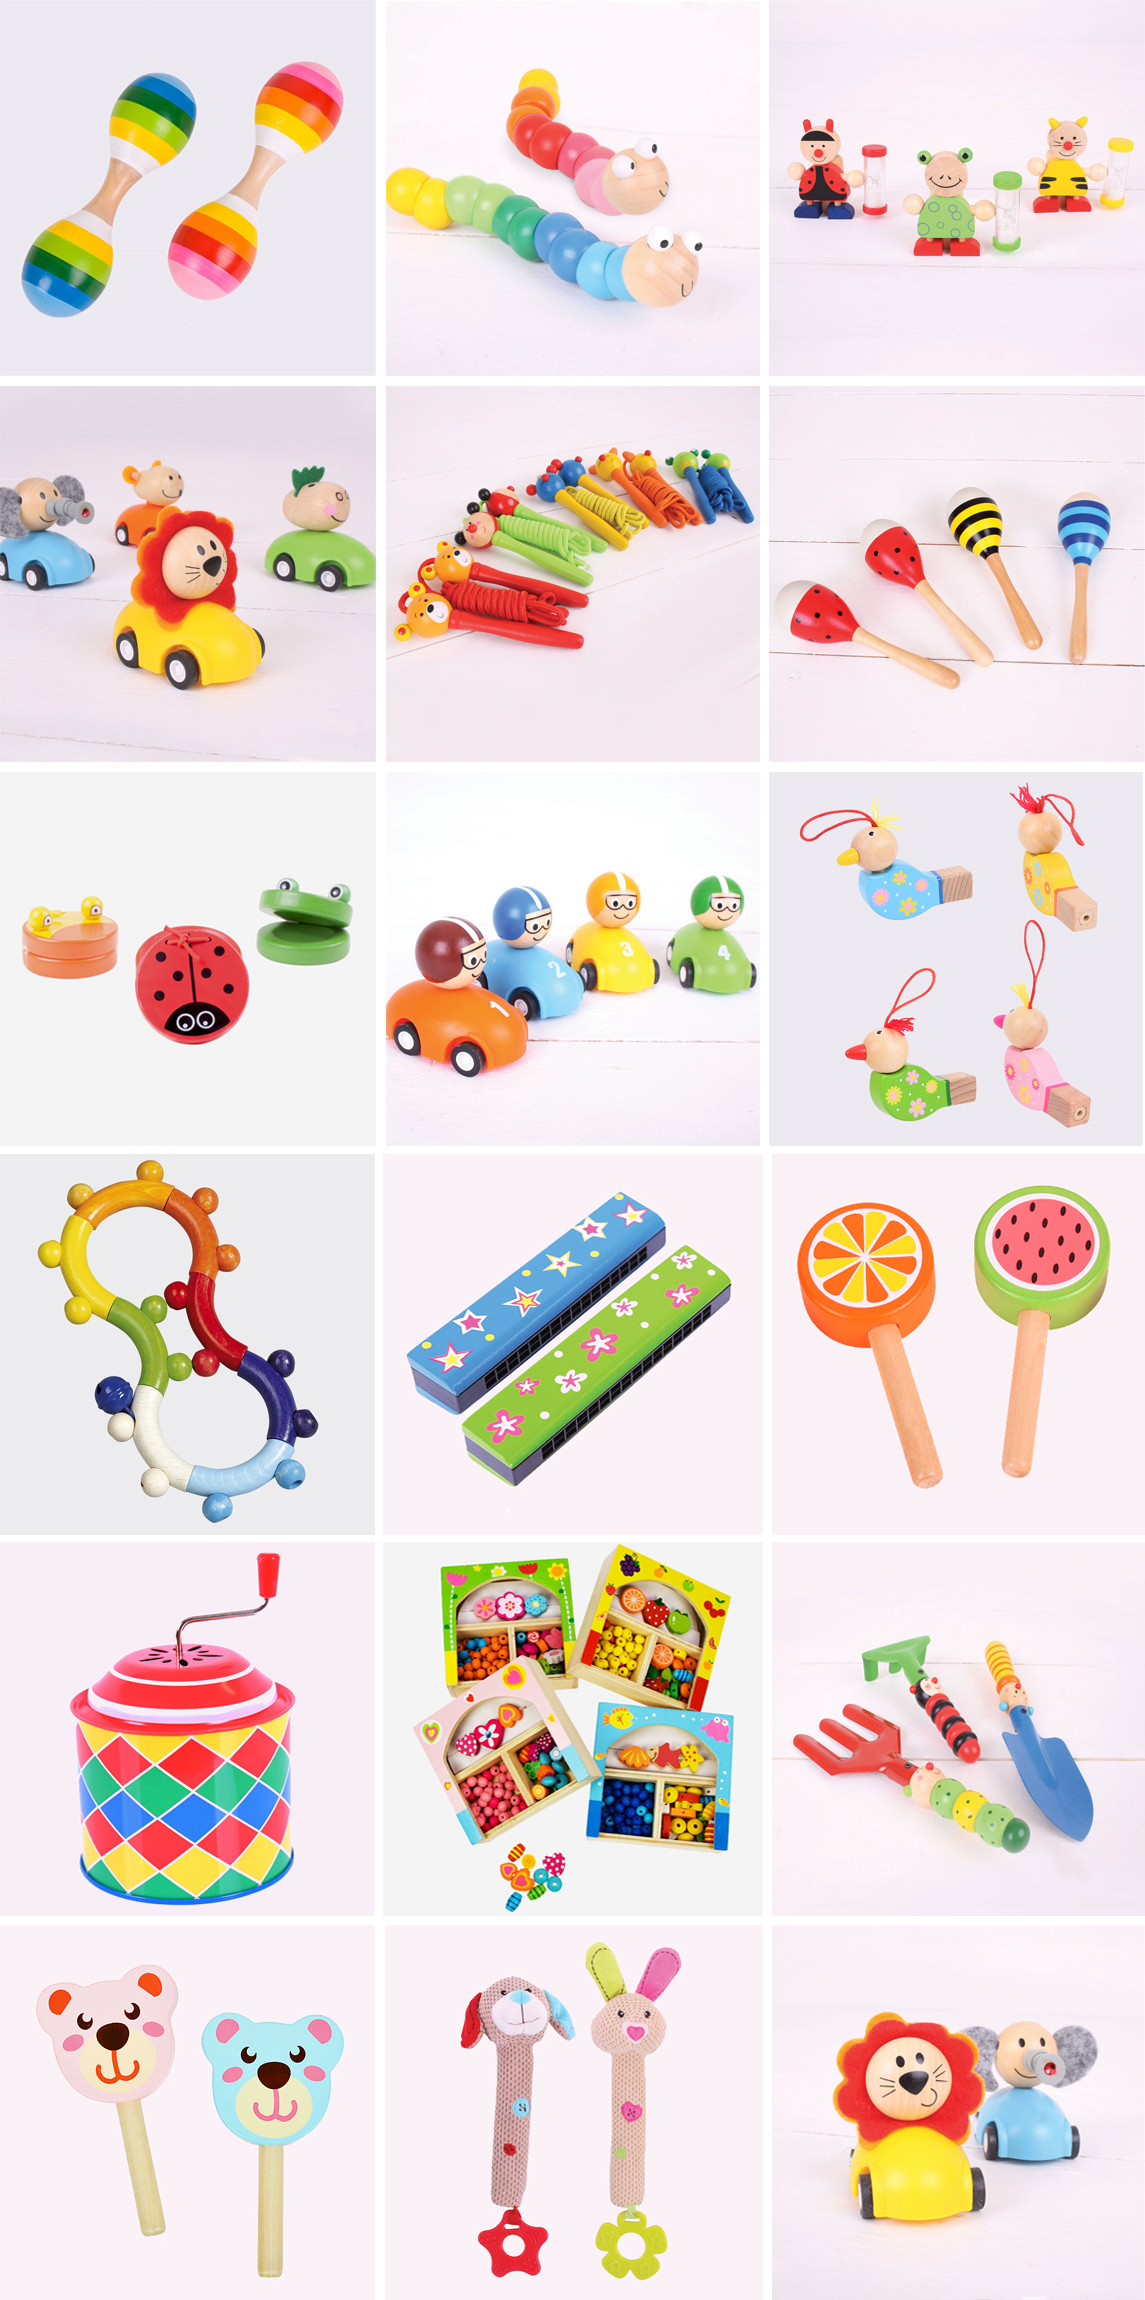 Små leksaker tillpresentkalender